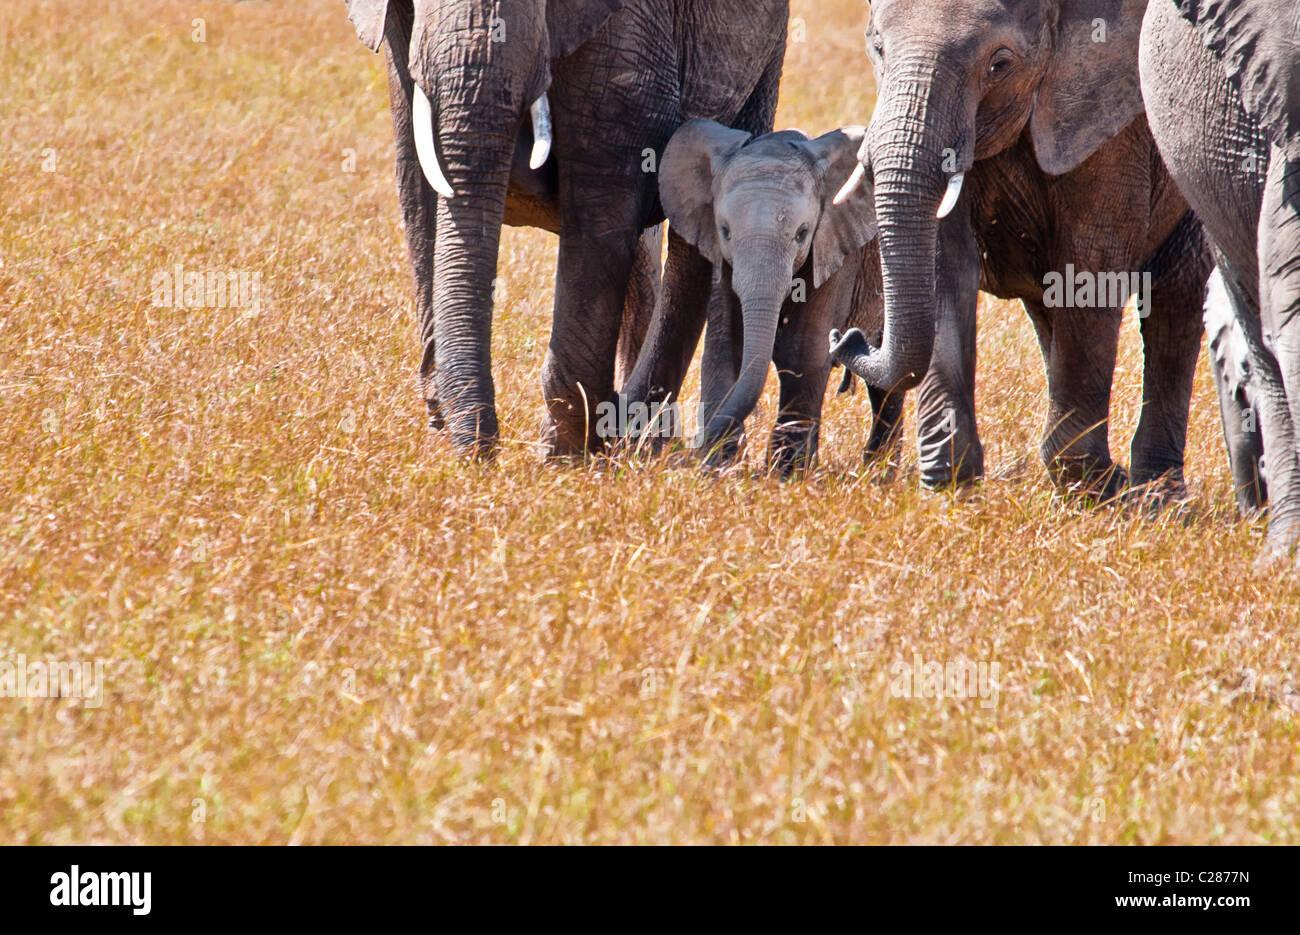 African Elephant Cows and Calf,  Loxodonta africana, Masai Mara National Reserve, Kenya, East Africa - Stock Image